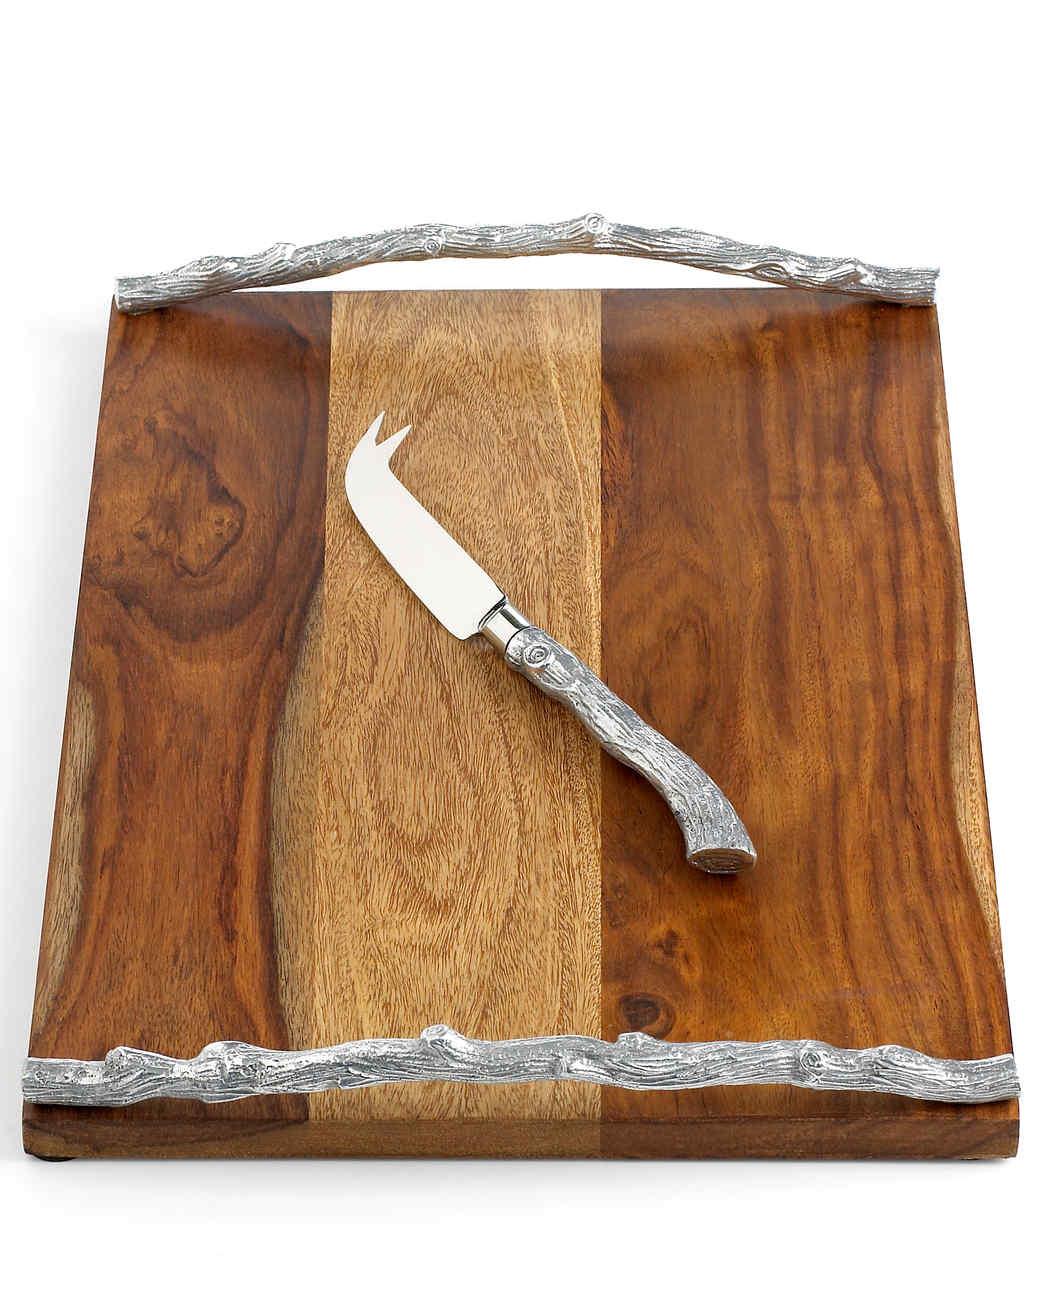 msmacys-parkwoods-cheeseboardwithknife-retail-0214.jpg